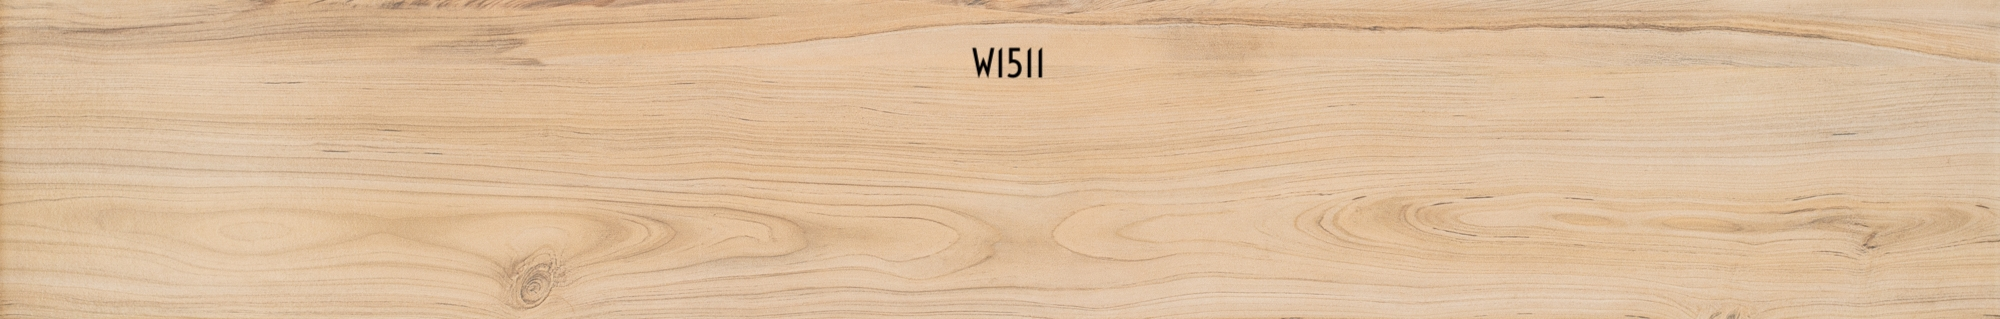 W1511